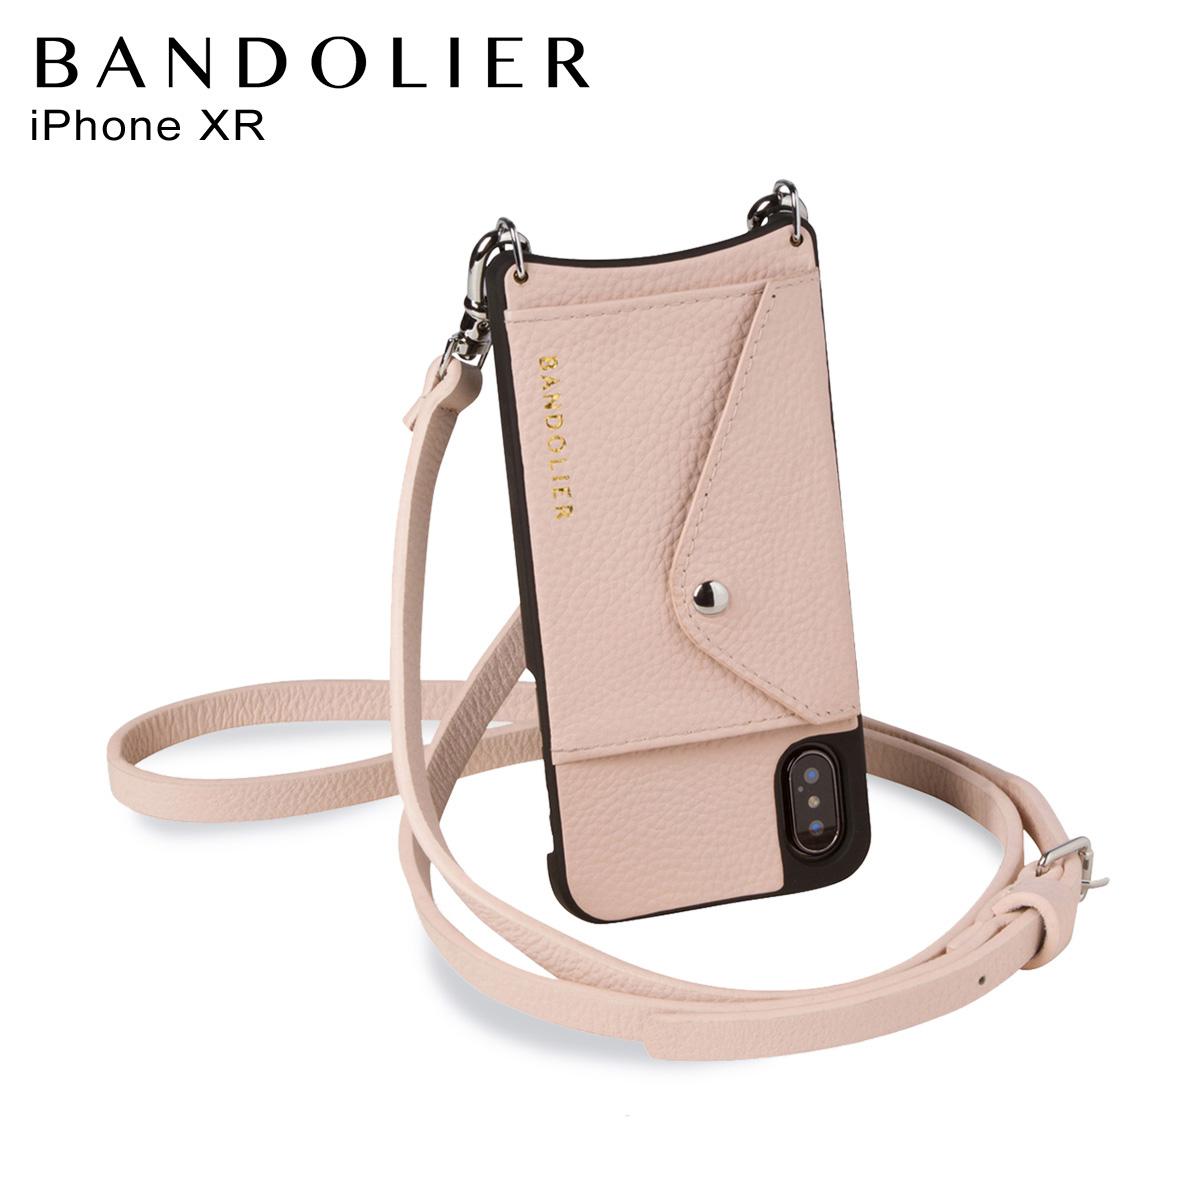 BANDOLIER バンドリヤー iPhone XR ケース スマホ 携帯 ショルダー アイフォン メンズ レディース レザー DONNA SIDE SLOT PINK ピンク 14DON